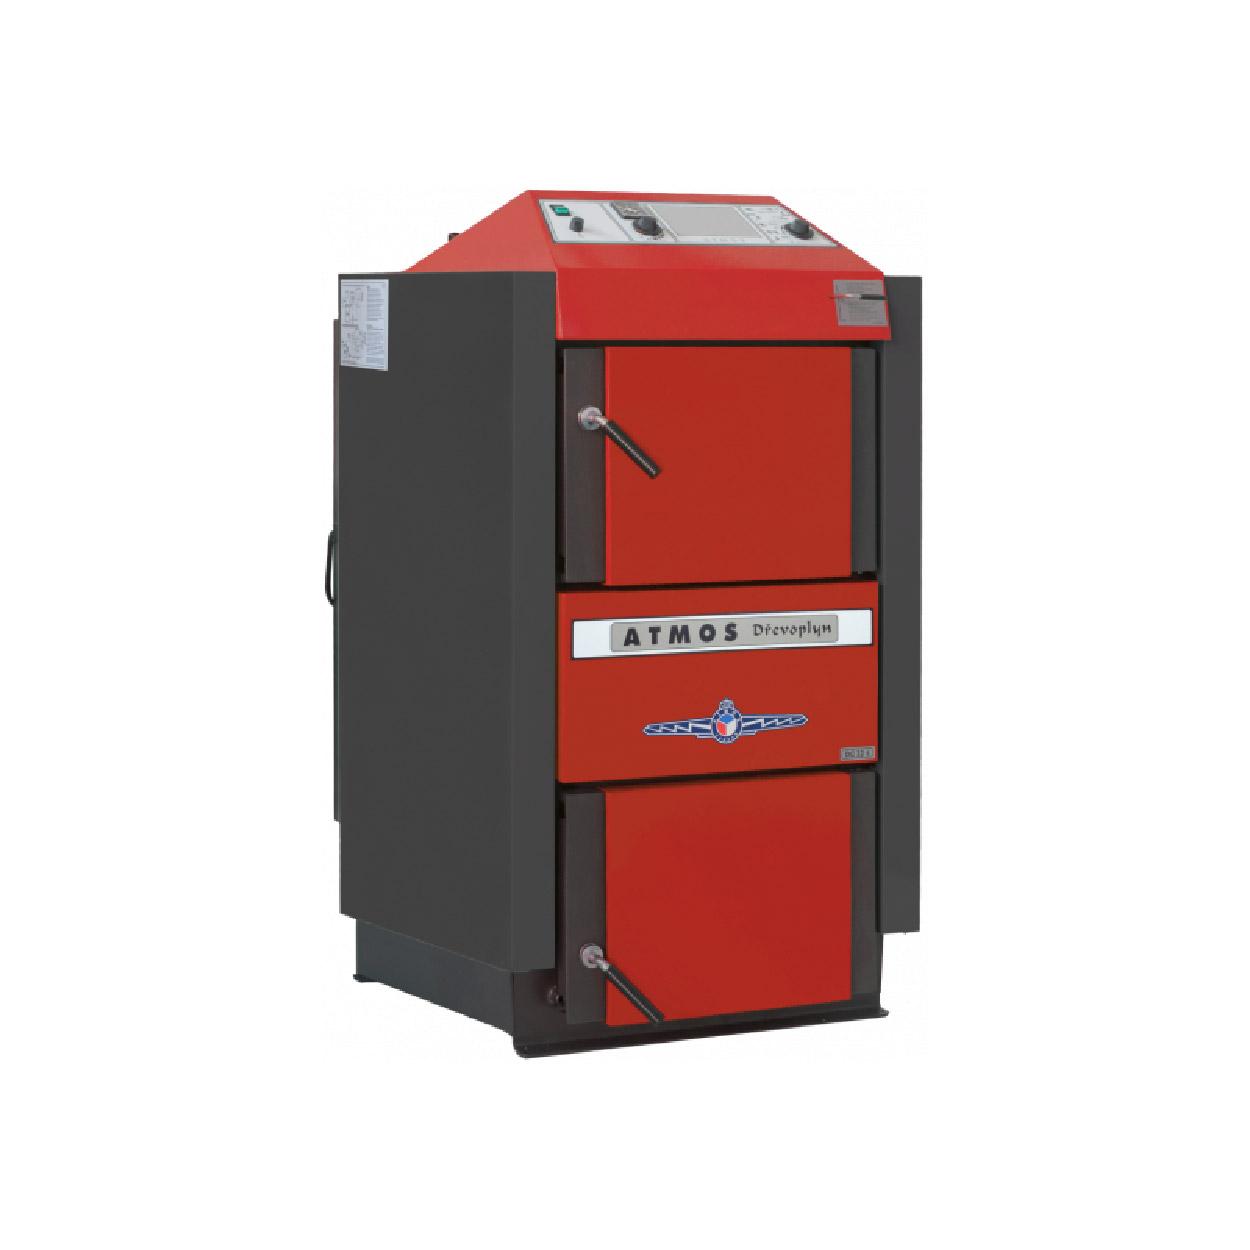 Centrala termica pe lemne ATMOS DC25GS 25 kW fornello imagine